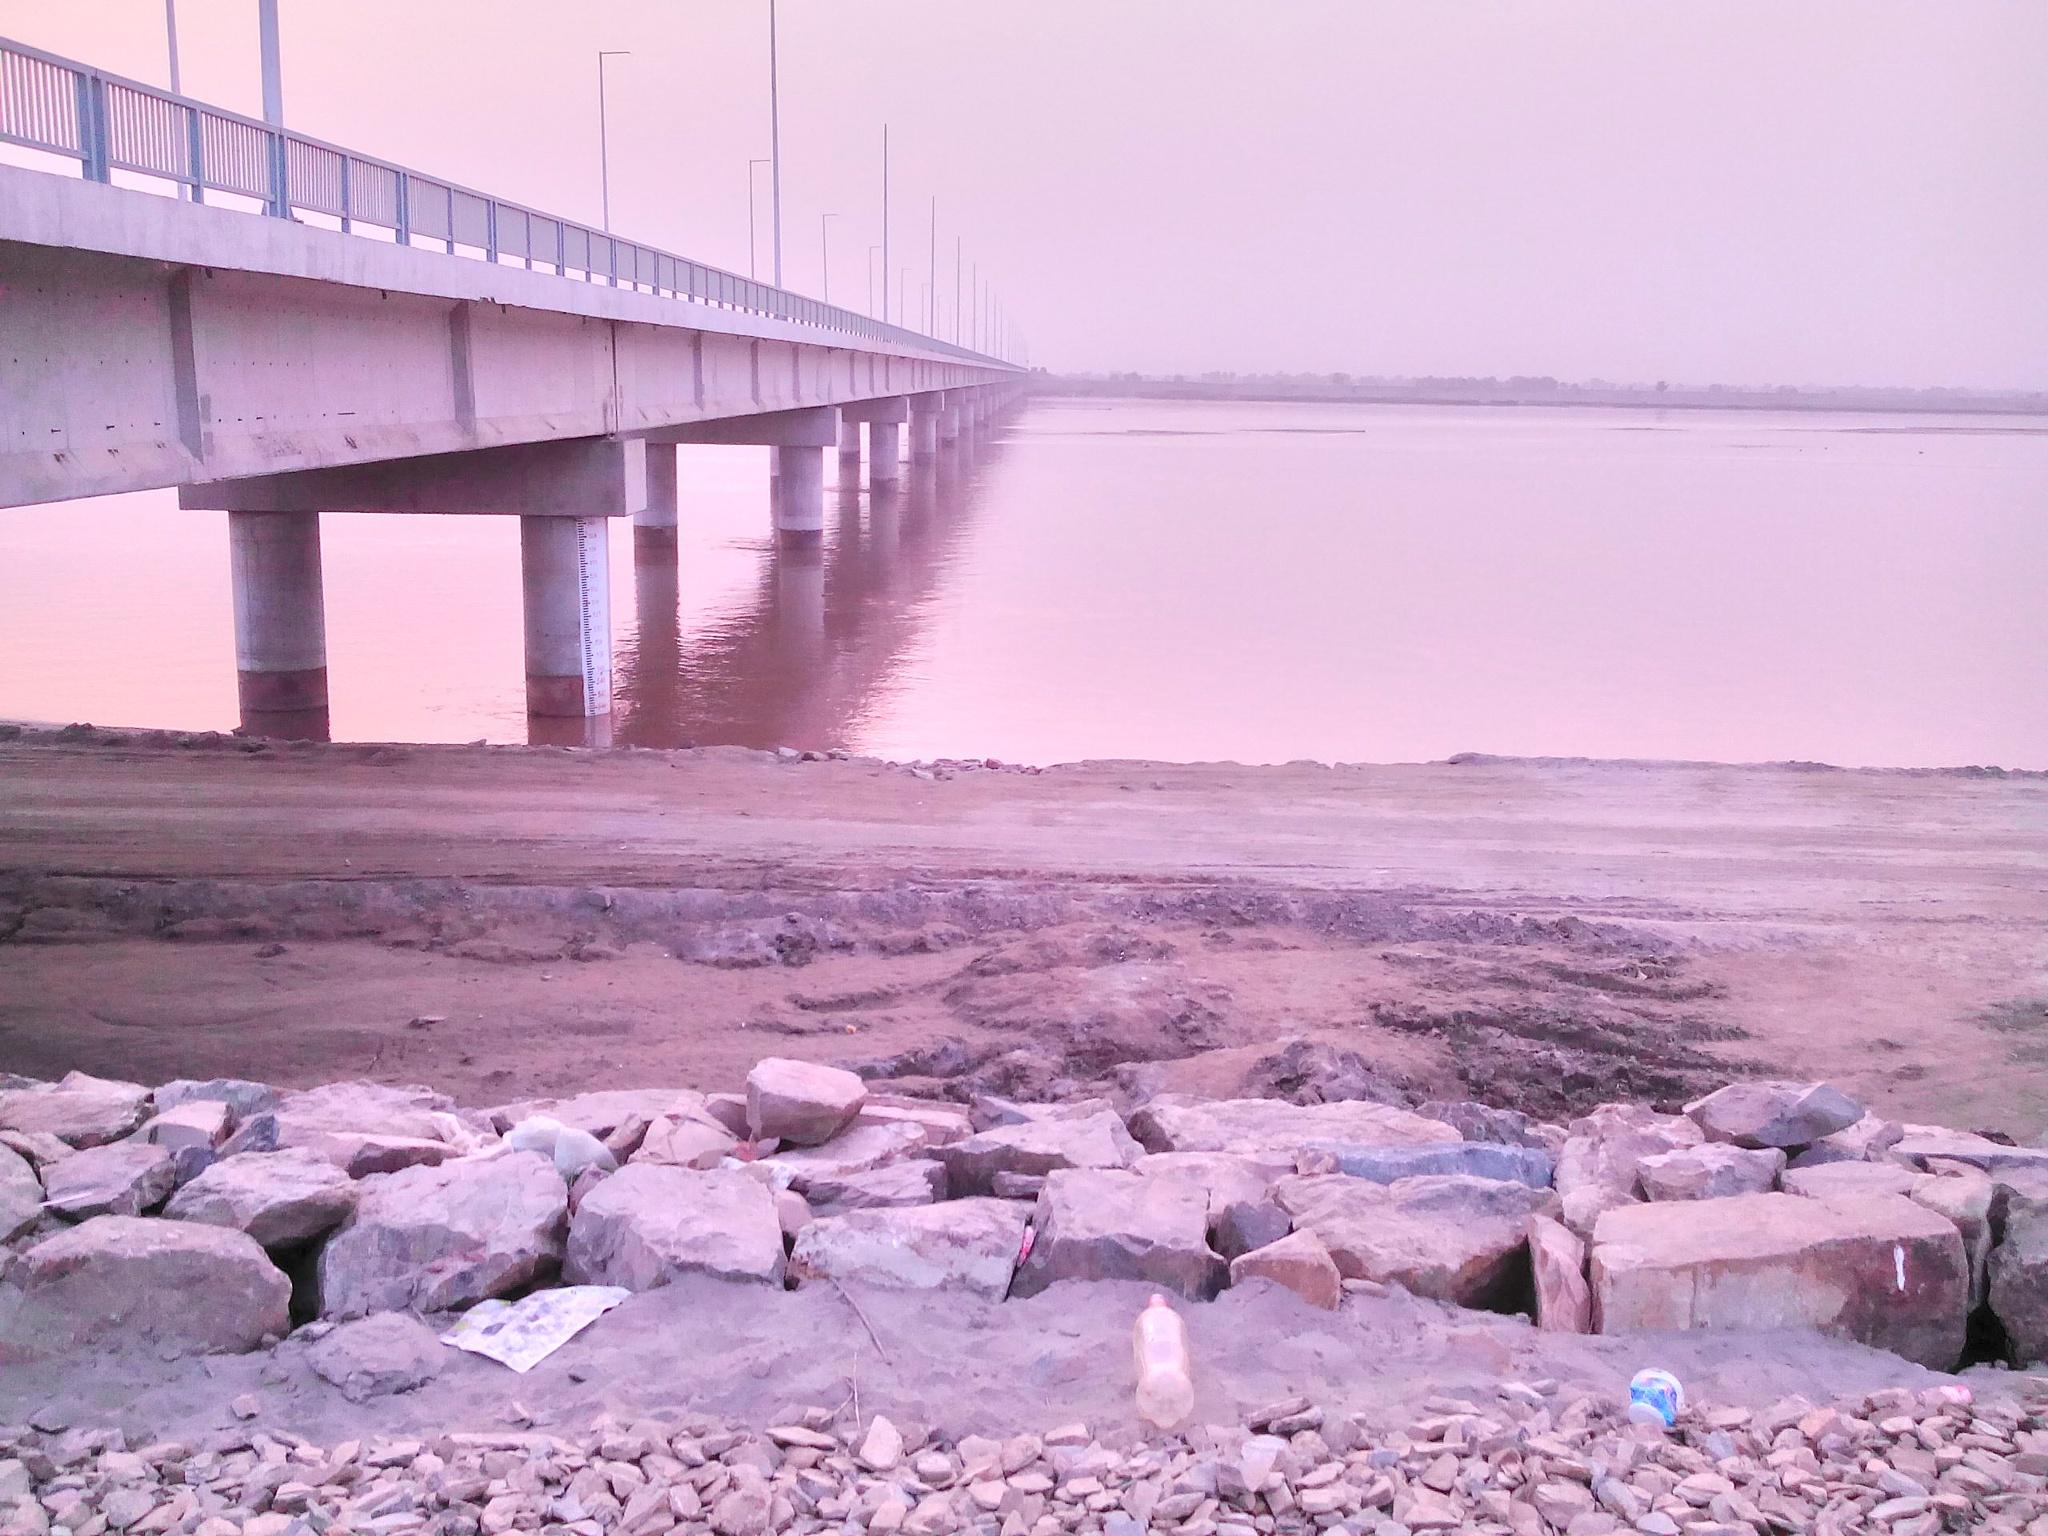 Bridge of Kalri at River Chenab  by Tayyab Tanveer